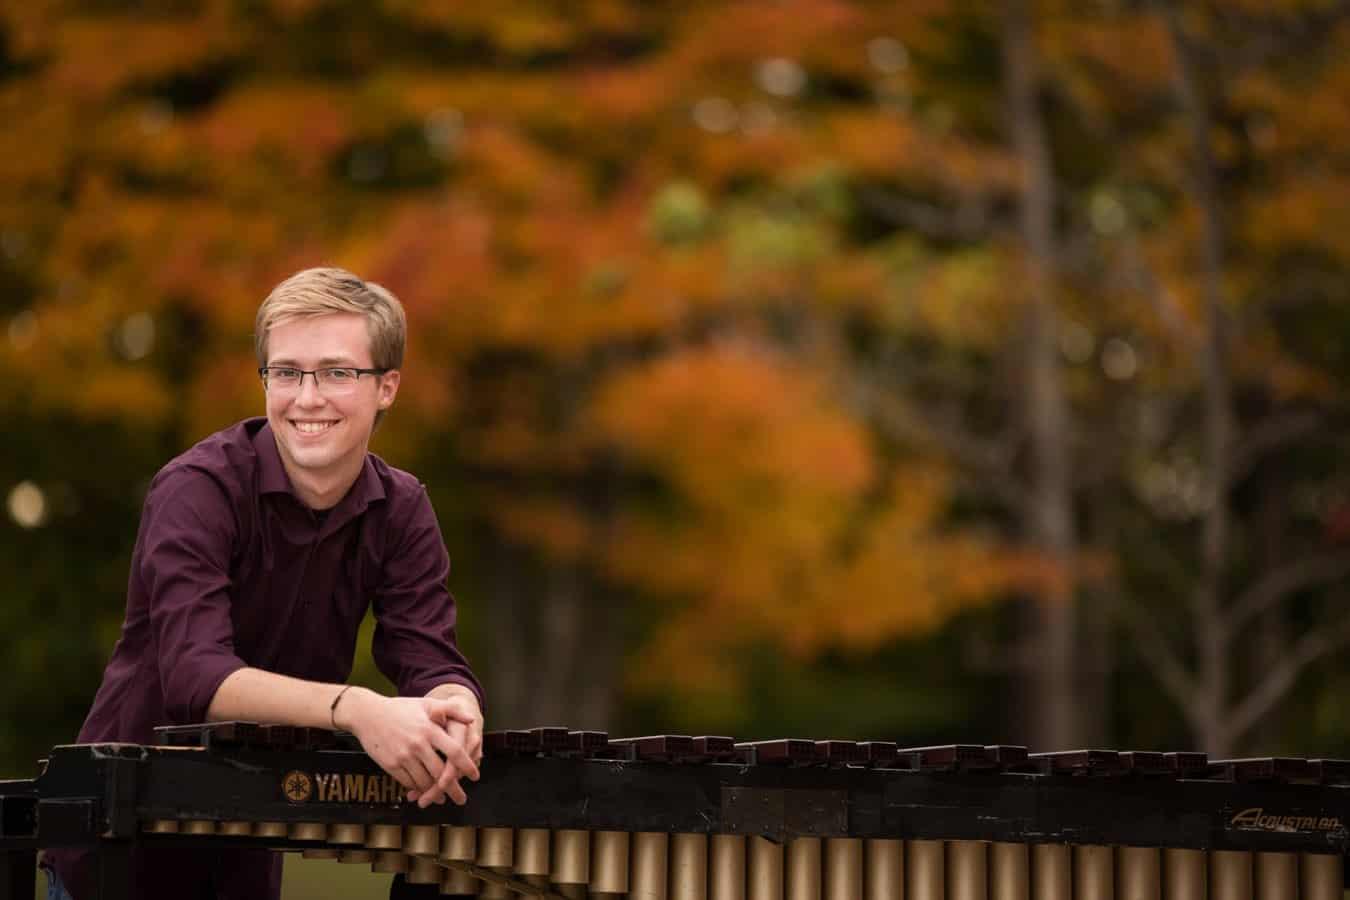 cleveland high school senior in portrait with musical instrument